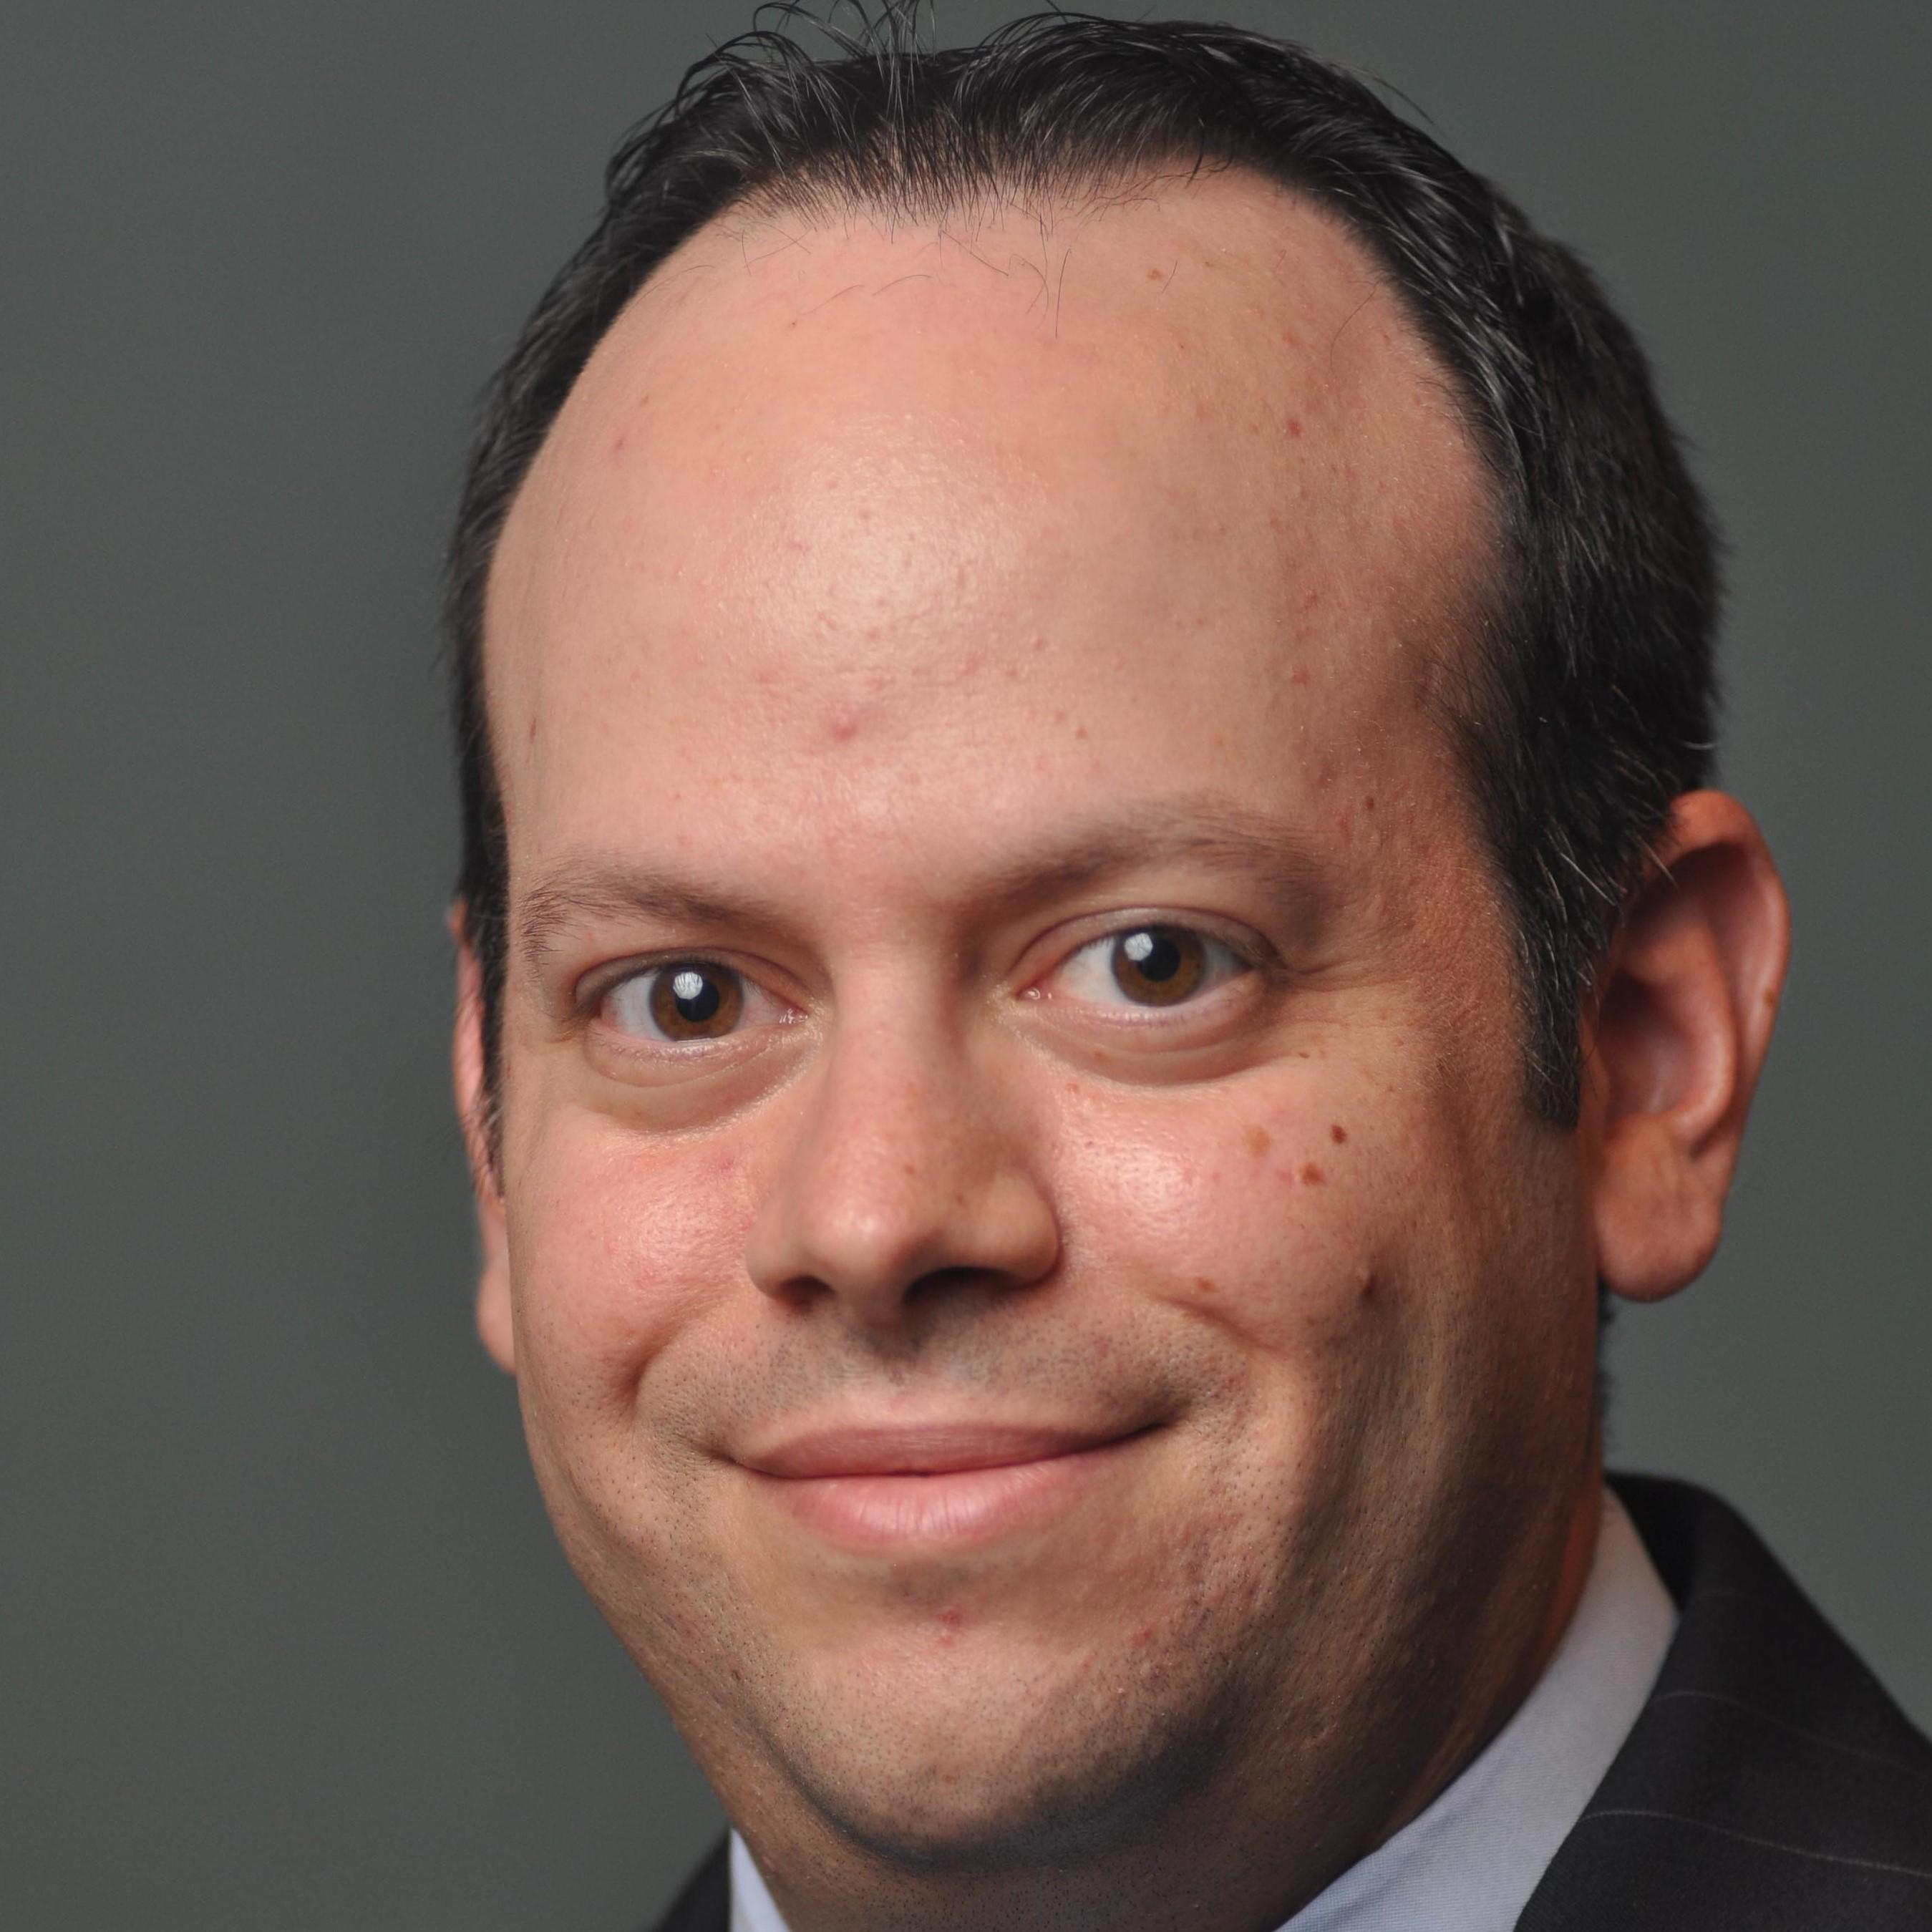 Marc Kravitz